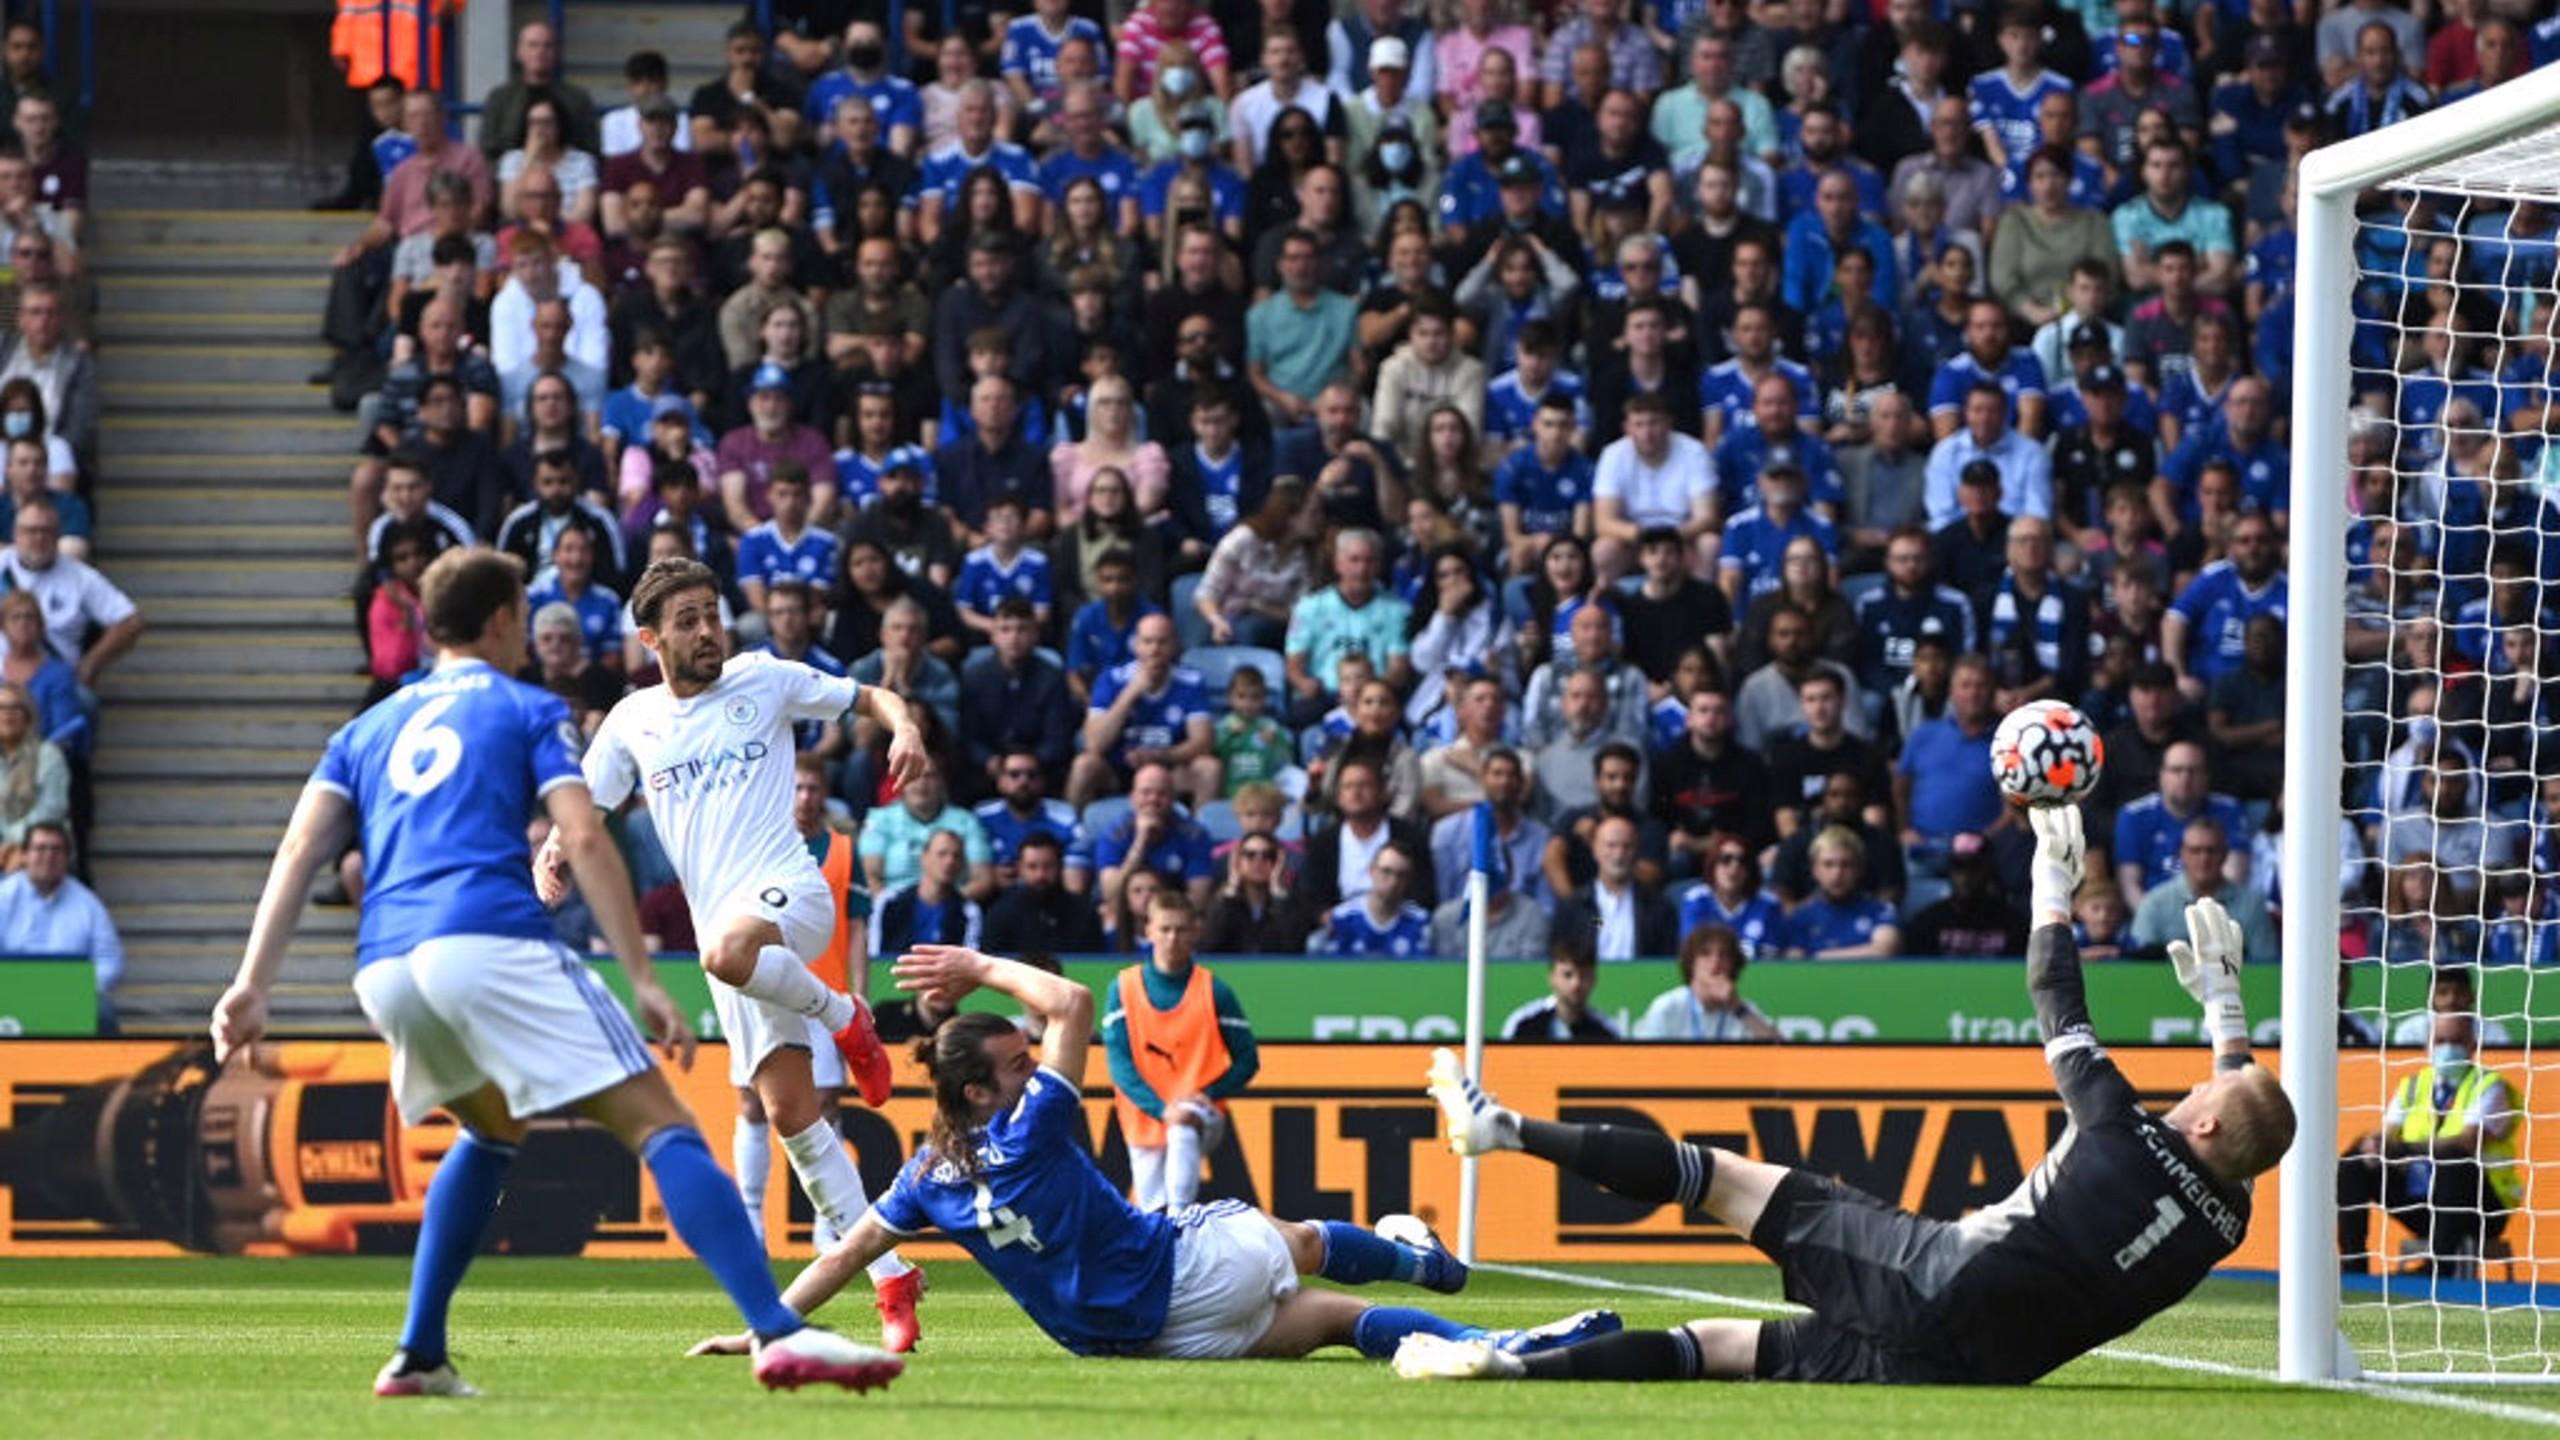 Leicester 0-1 City : les images